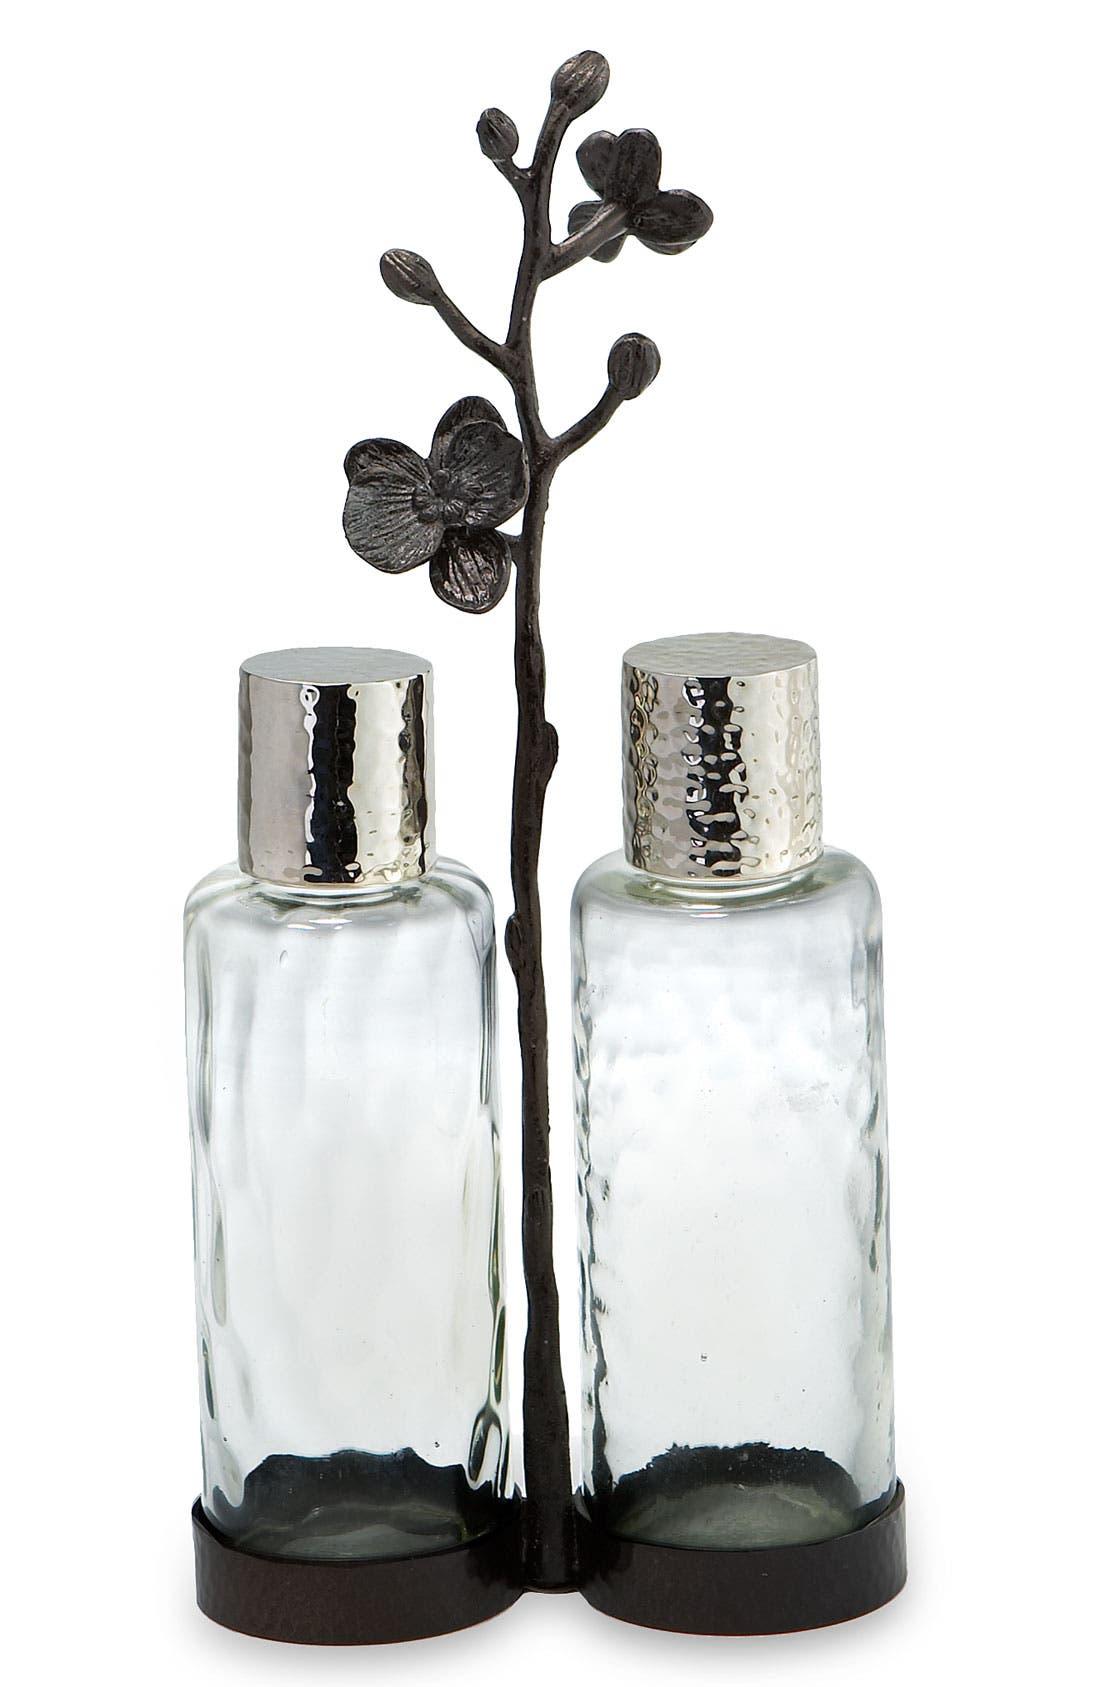 Alternate Image 1 Selected - Michael Aram 'Black Orchid' Caddy